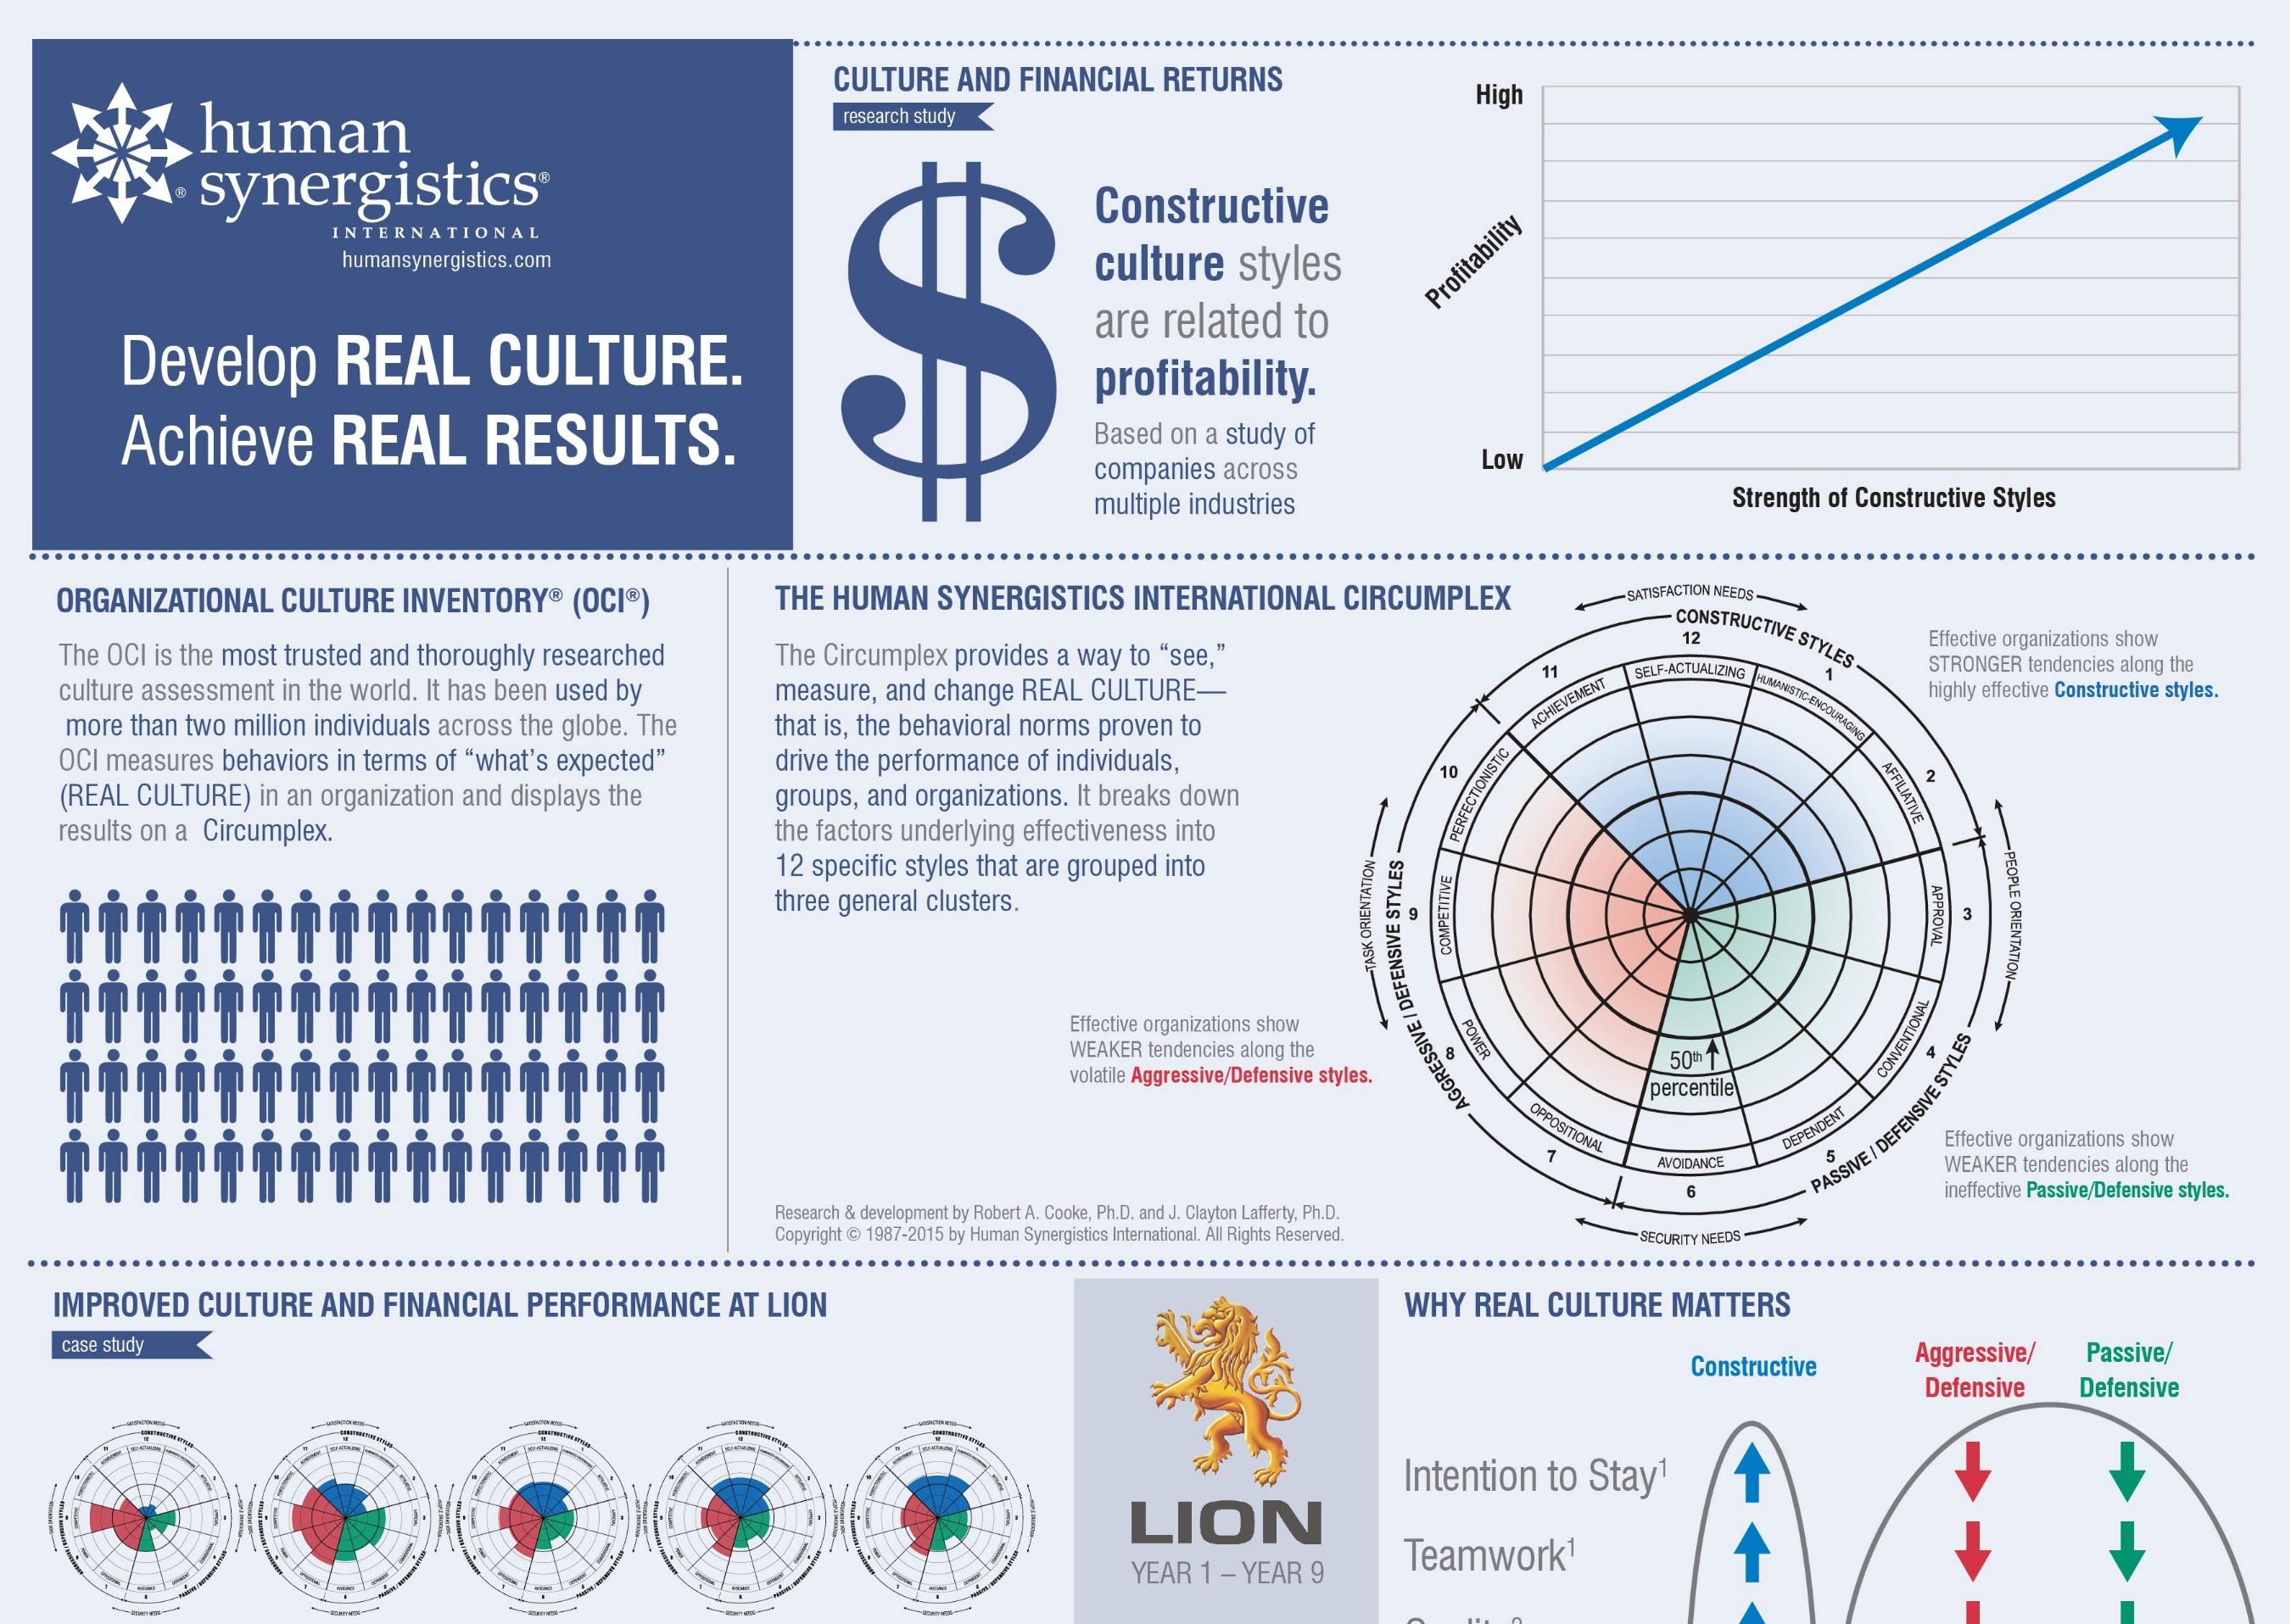 Financial_Returns_Infographic_crop